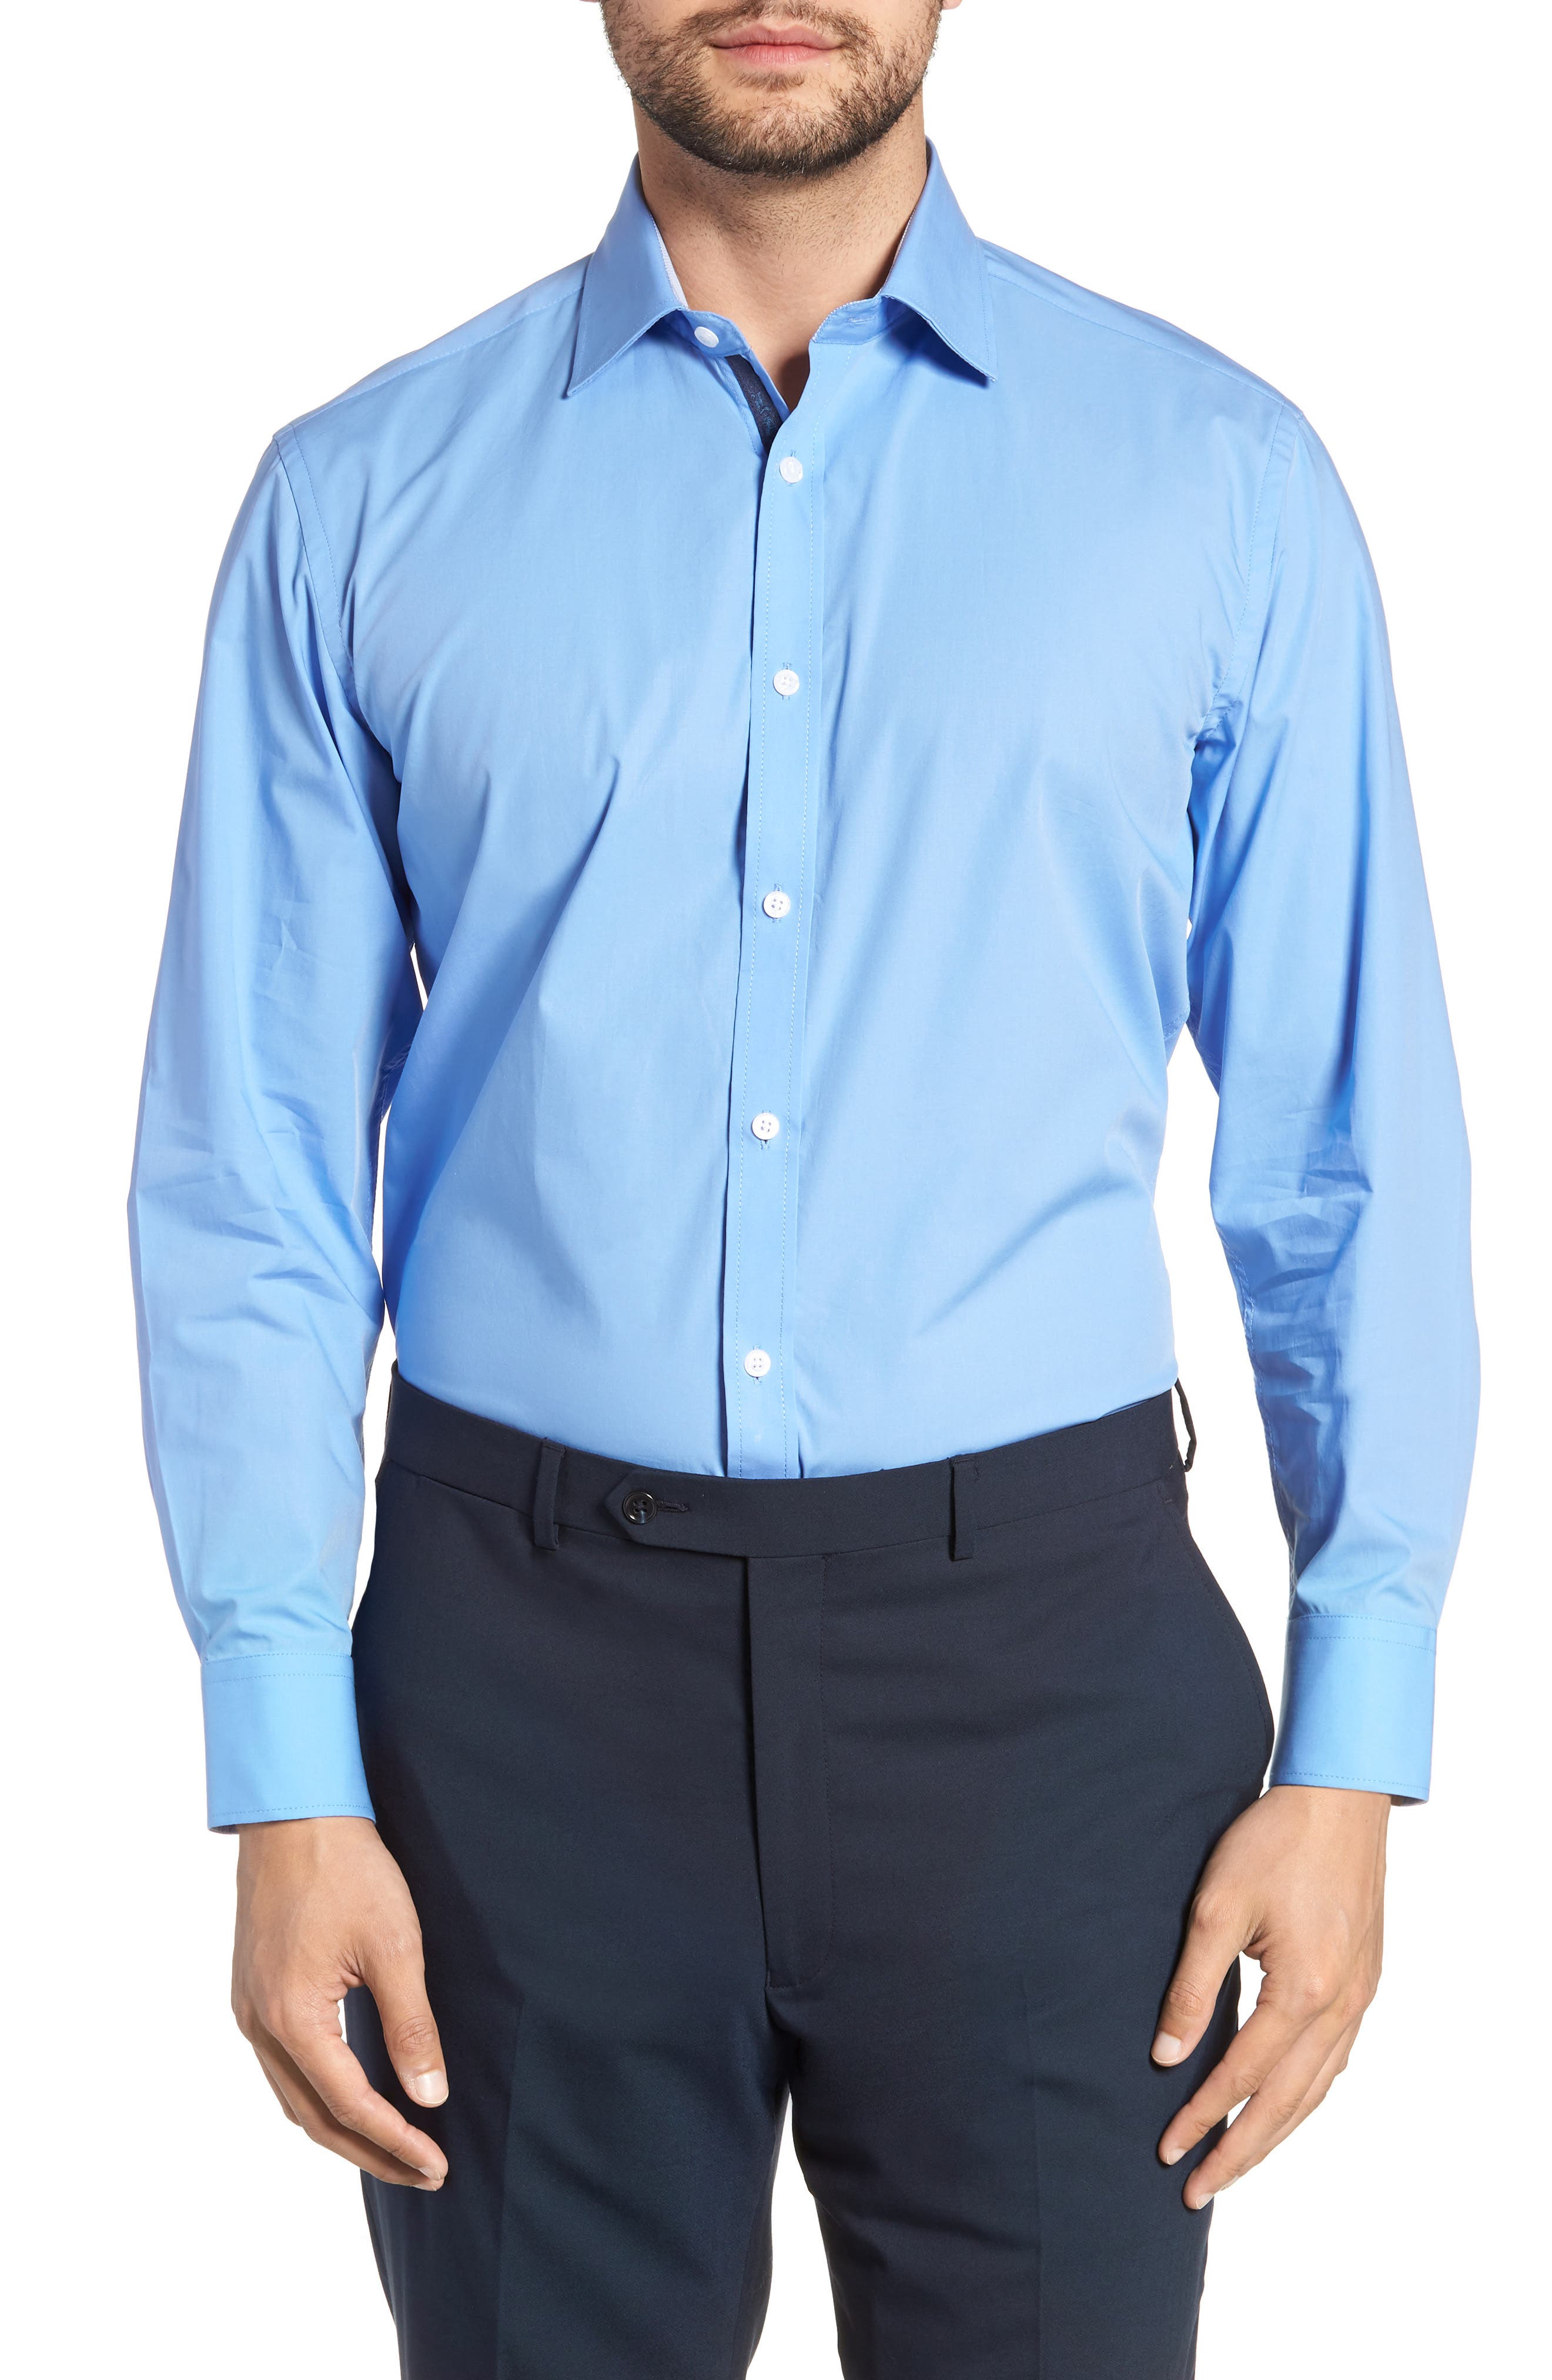 Regular Fit Stretch Solid Dress Shirt,                             Main thumbnail 1, color,                             BLUE